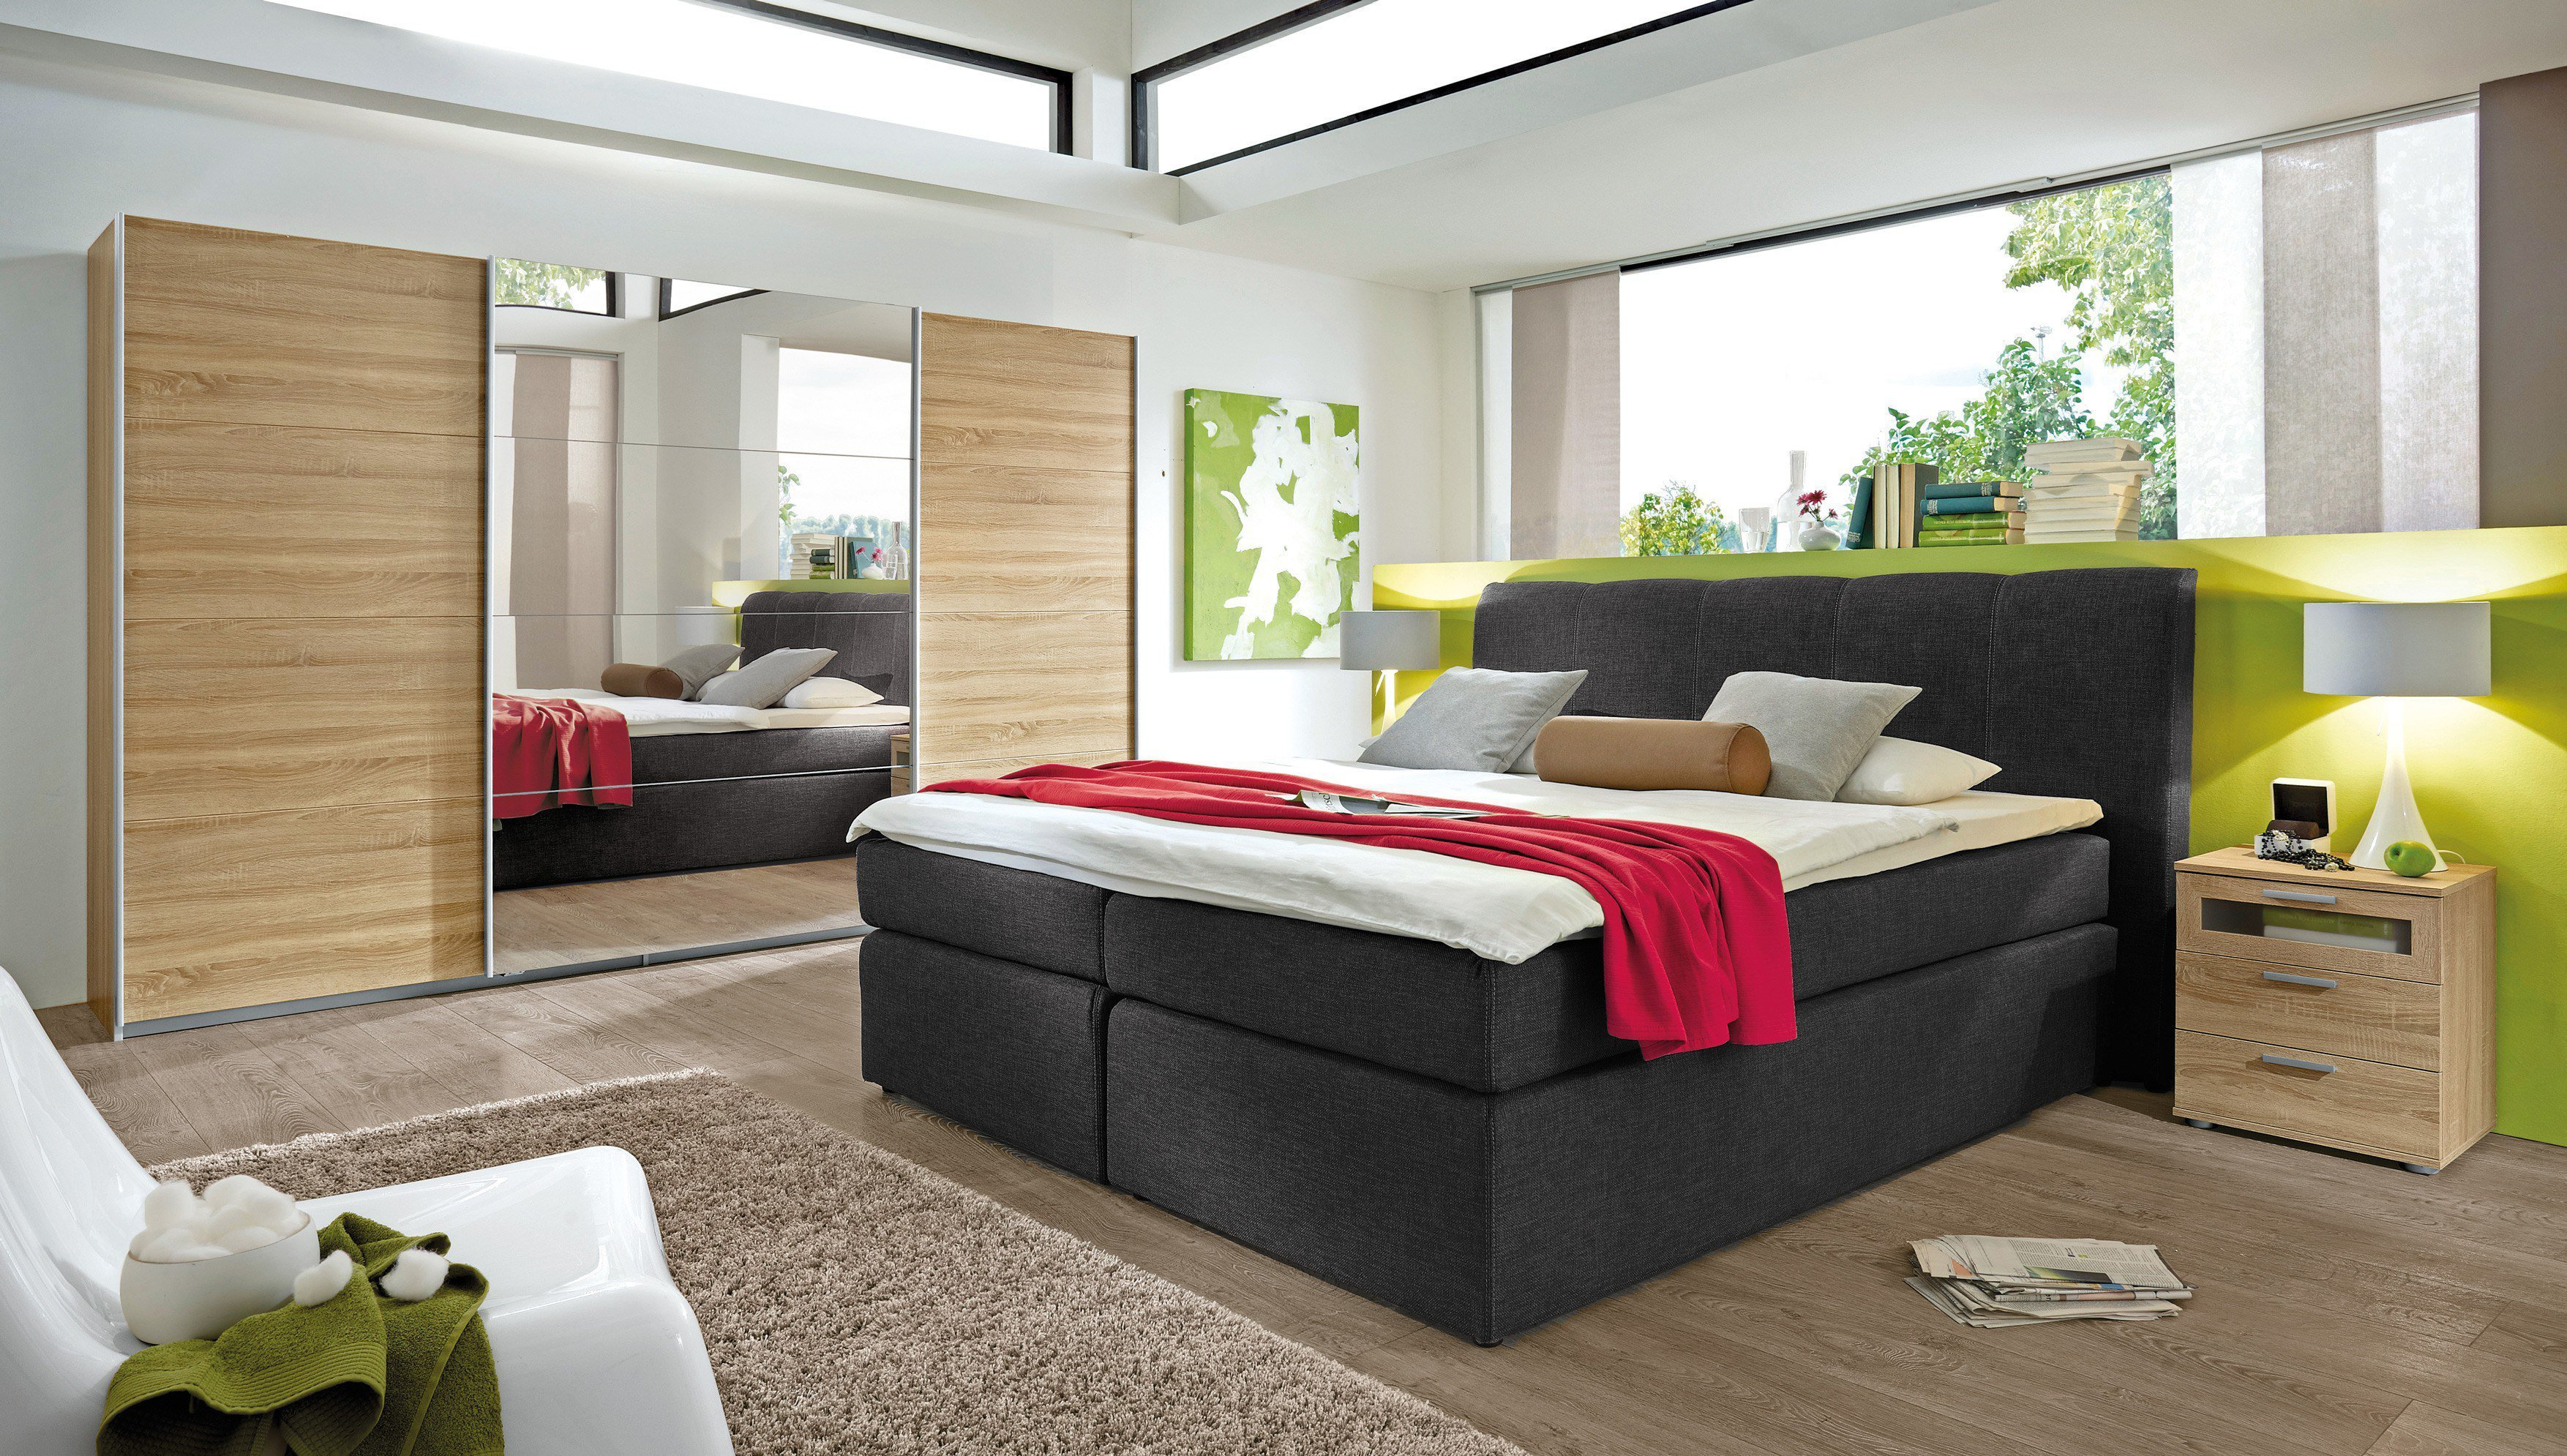 jockenh fer boxspringbett heaven anthrazit m bel letz ihr online shop. Black Bedroom Furniture Sets. Home Design Ideas